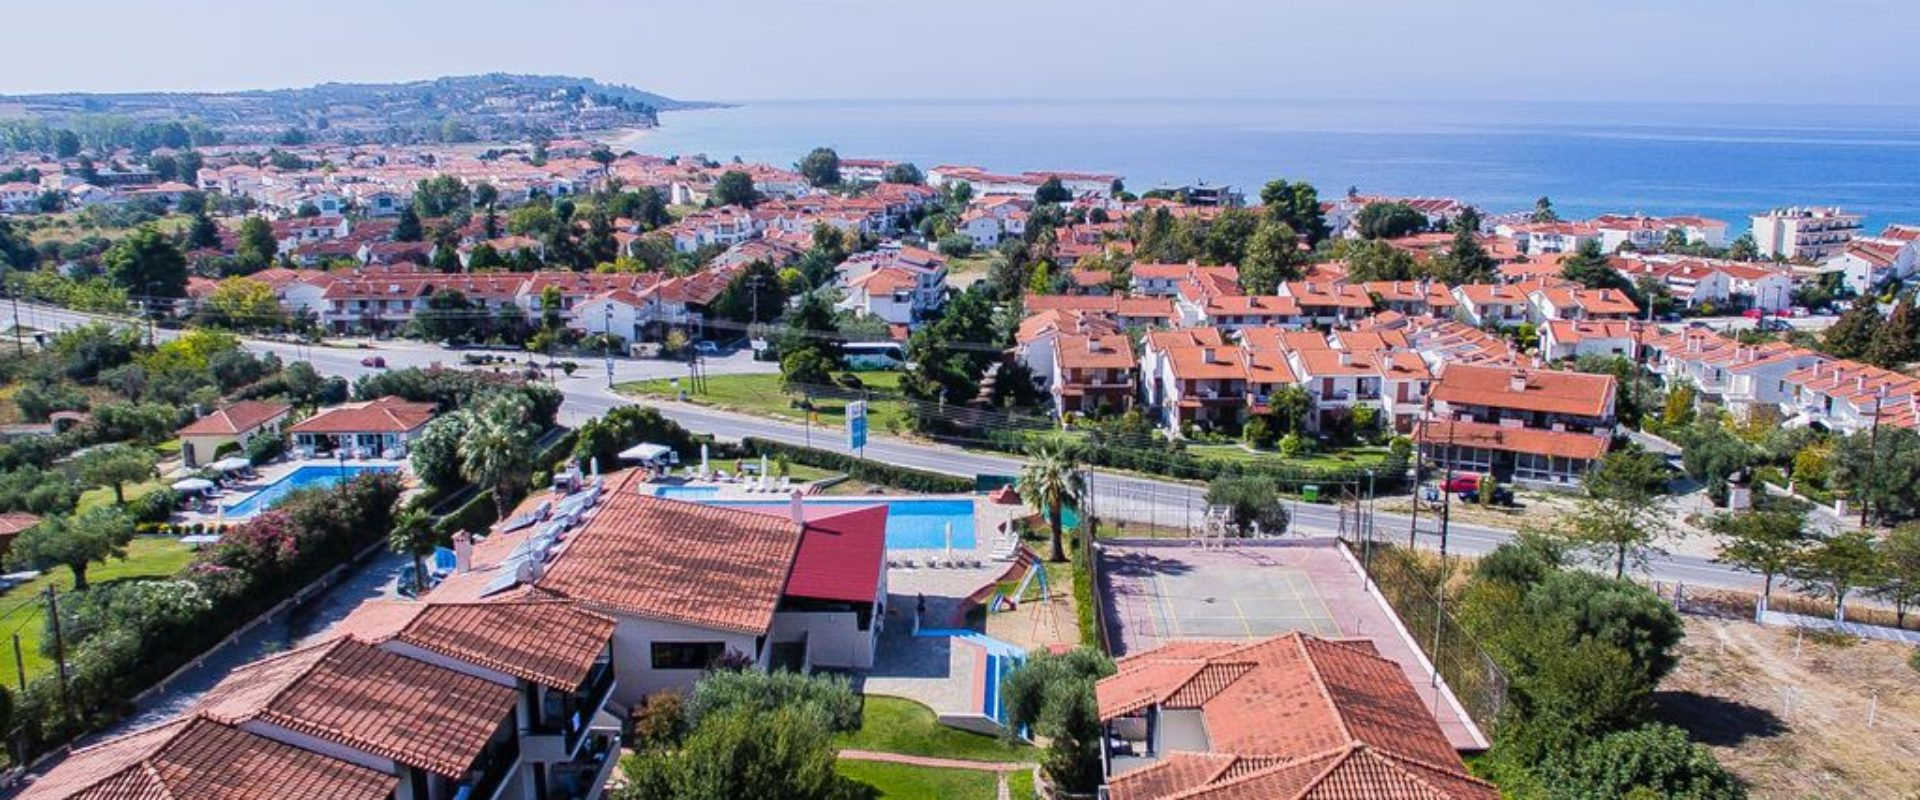 Odihnă la mare 2020, Grecia, Halkidiki, Hotel Bellagio